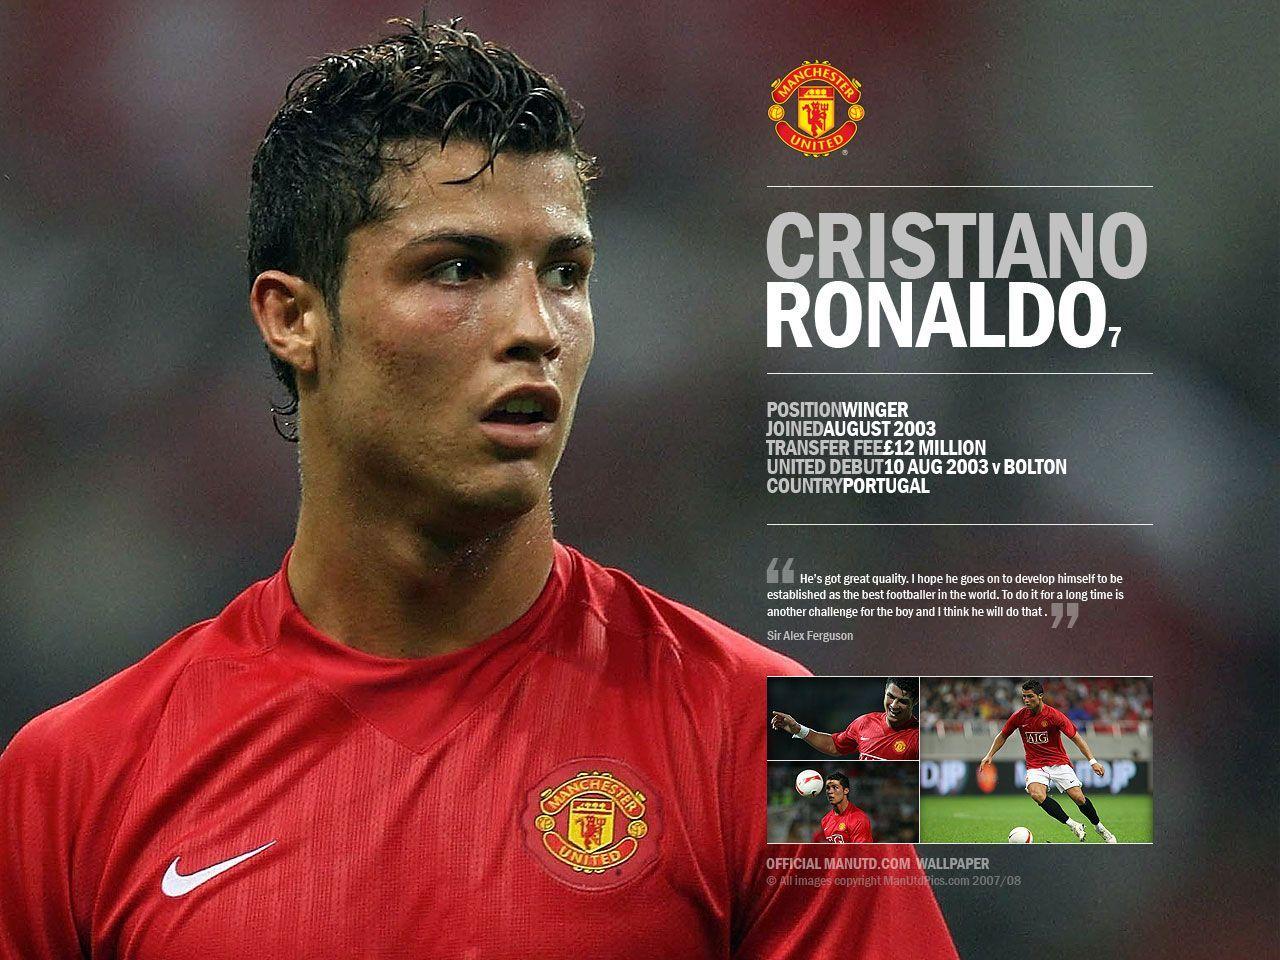 Football Cristiano Ronaldo Wallpaper Manchester United 105 Jpg 1280 960 Cristiano Ronaldo Hd Wallpapers Cristiano Ronaldo Ronaldo